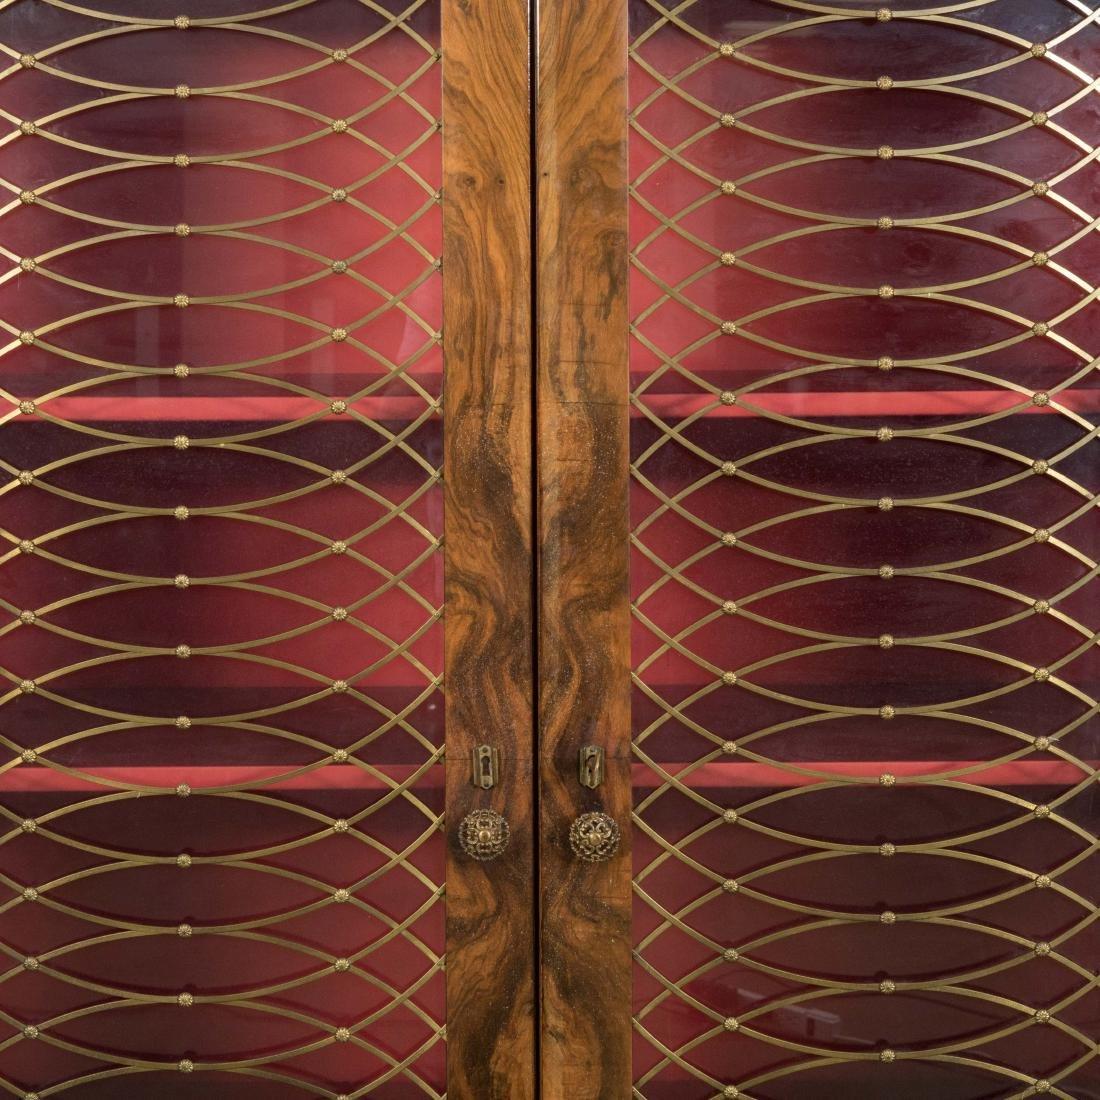 Burled English Art Deco Armoire - Epstein Brothers - 3